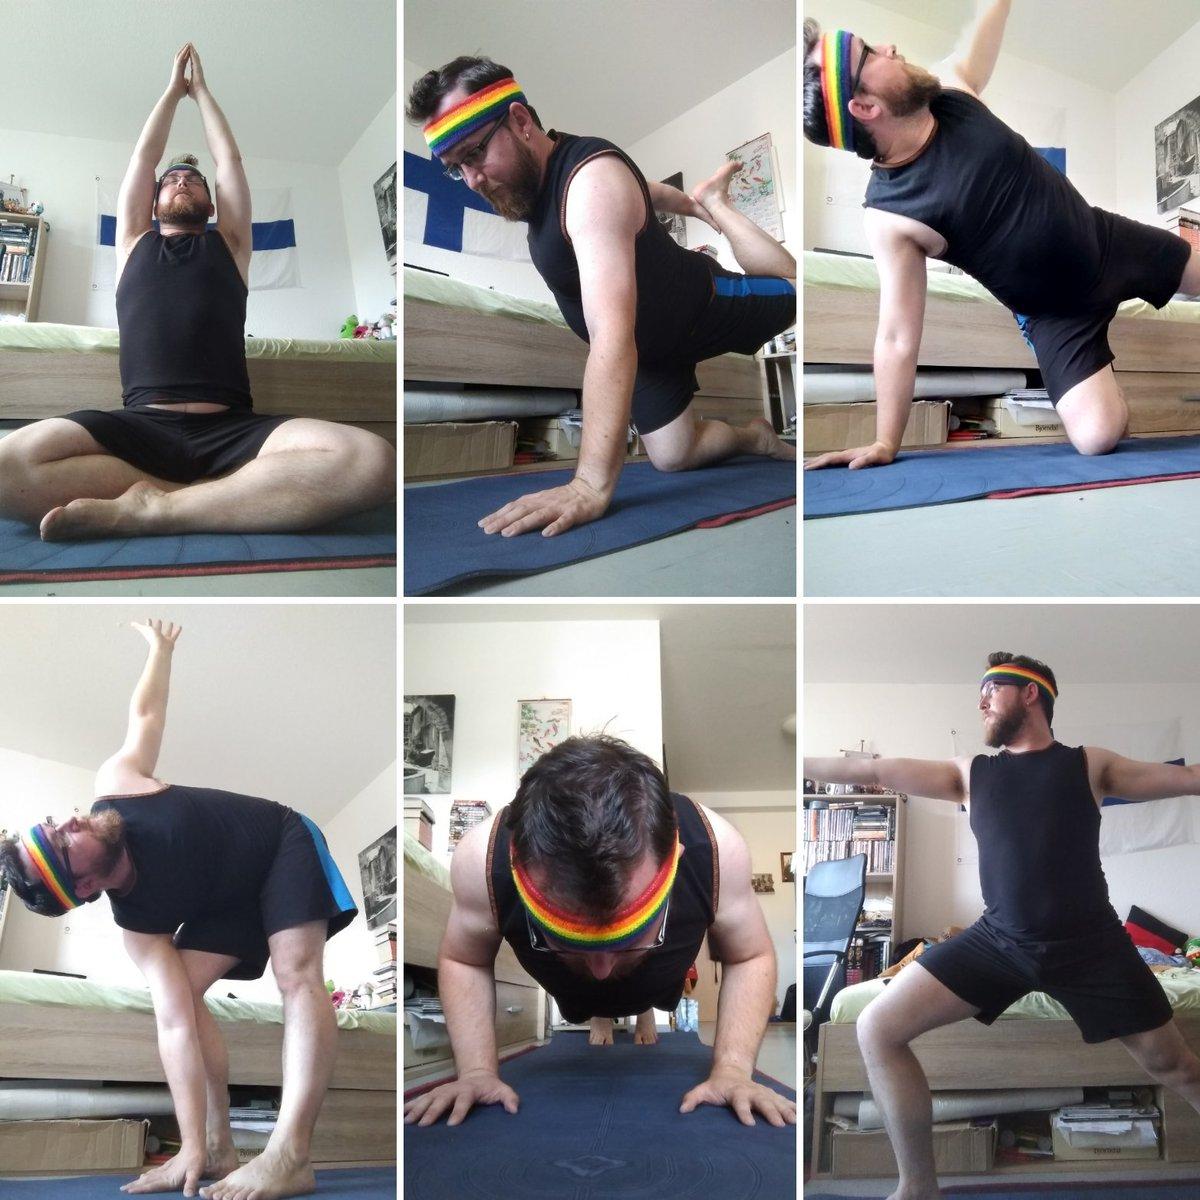 It was time for my weekly #yoga time!  #asana #spiceboy #sportyspice #rainbow https://t.co/O87uTQSbfA